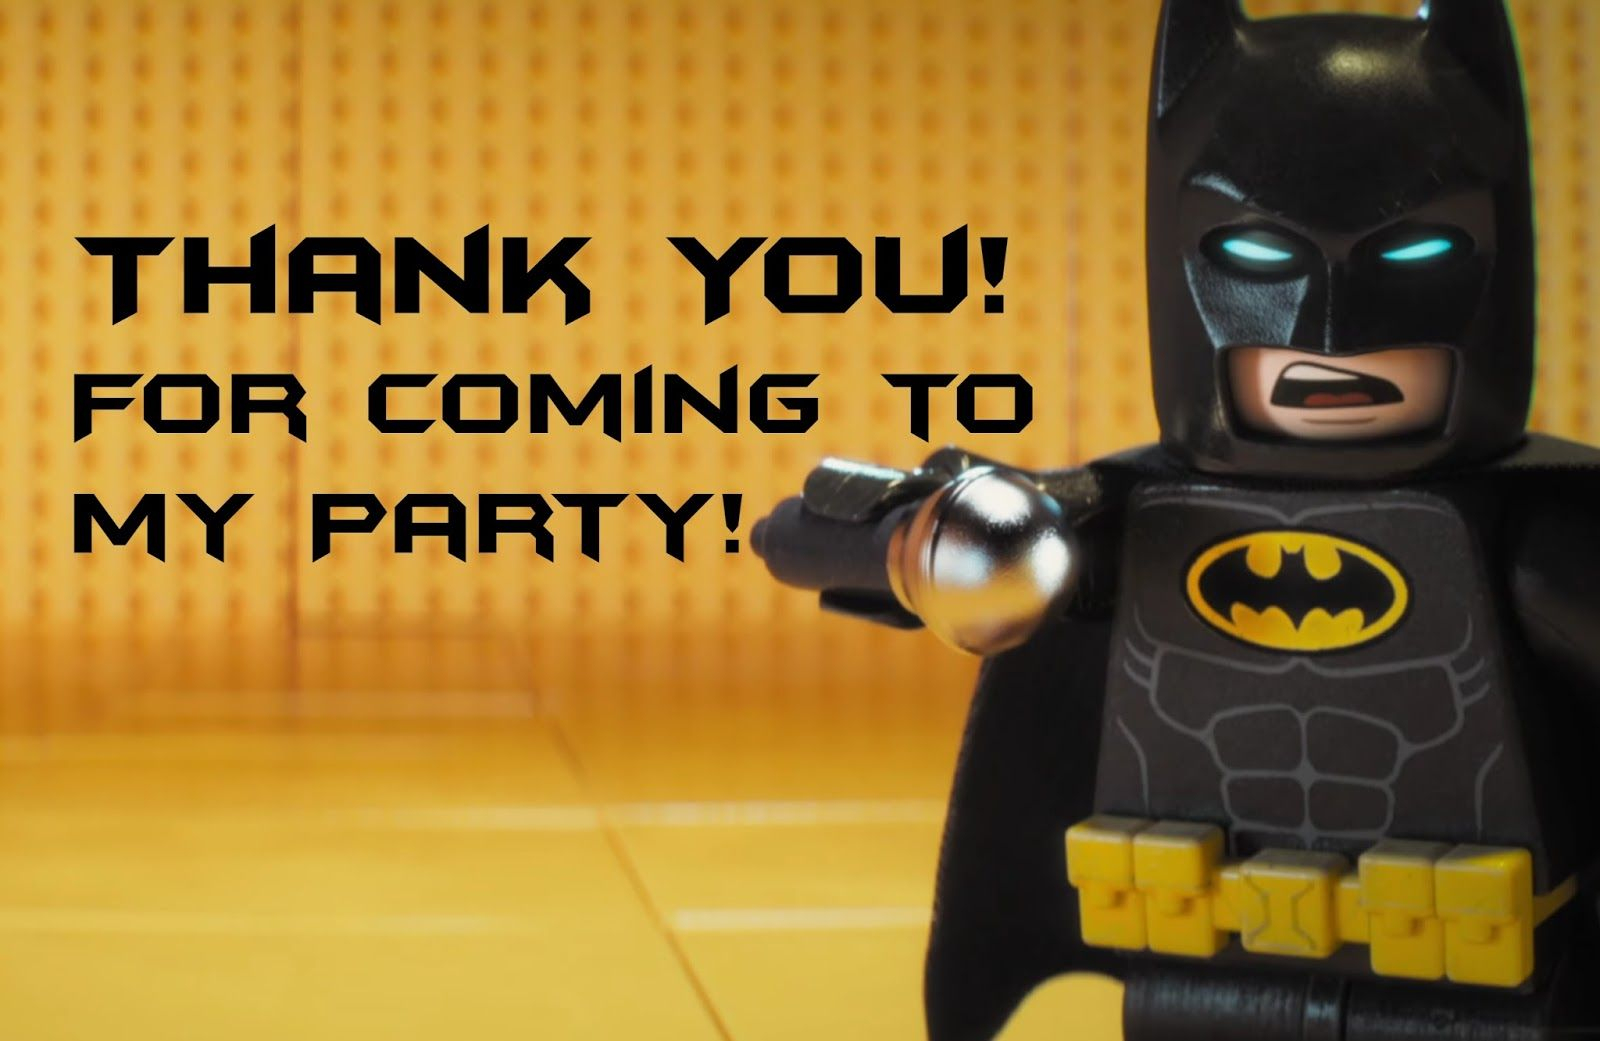 Lego Batman Thank You Cards   Lego Batman-Super Heros Printables - Lego Batman Invitations Free Printable